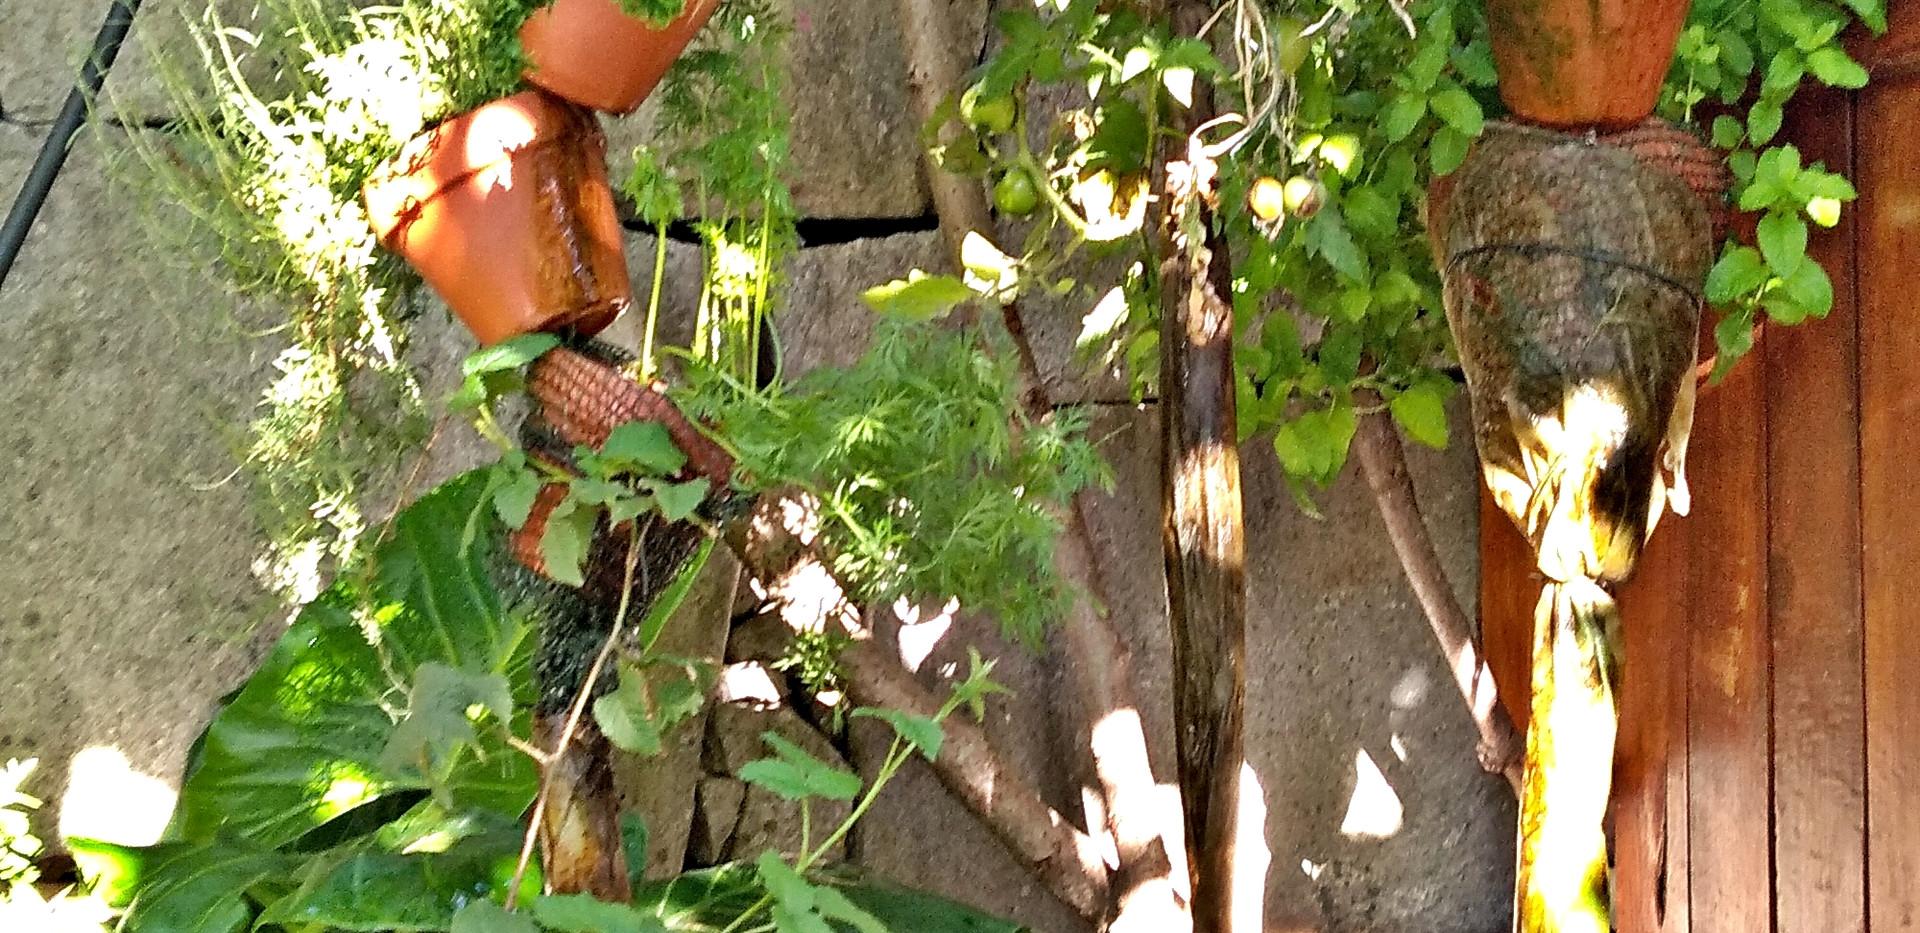 Coluna de Vasos de Aromáticas, Tomateiros Invertidos, Arruda, Hortelã da Ribeira,   Samambaia, Framboesas, Cuphea, Menta, ...